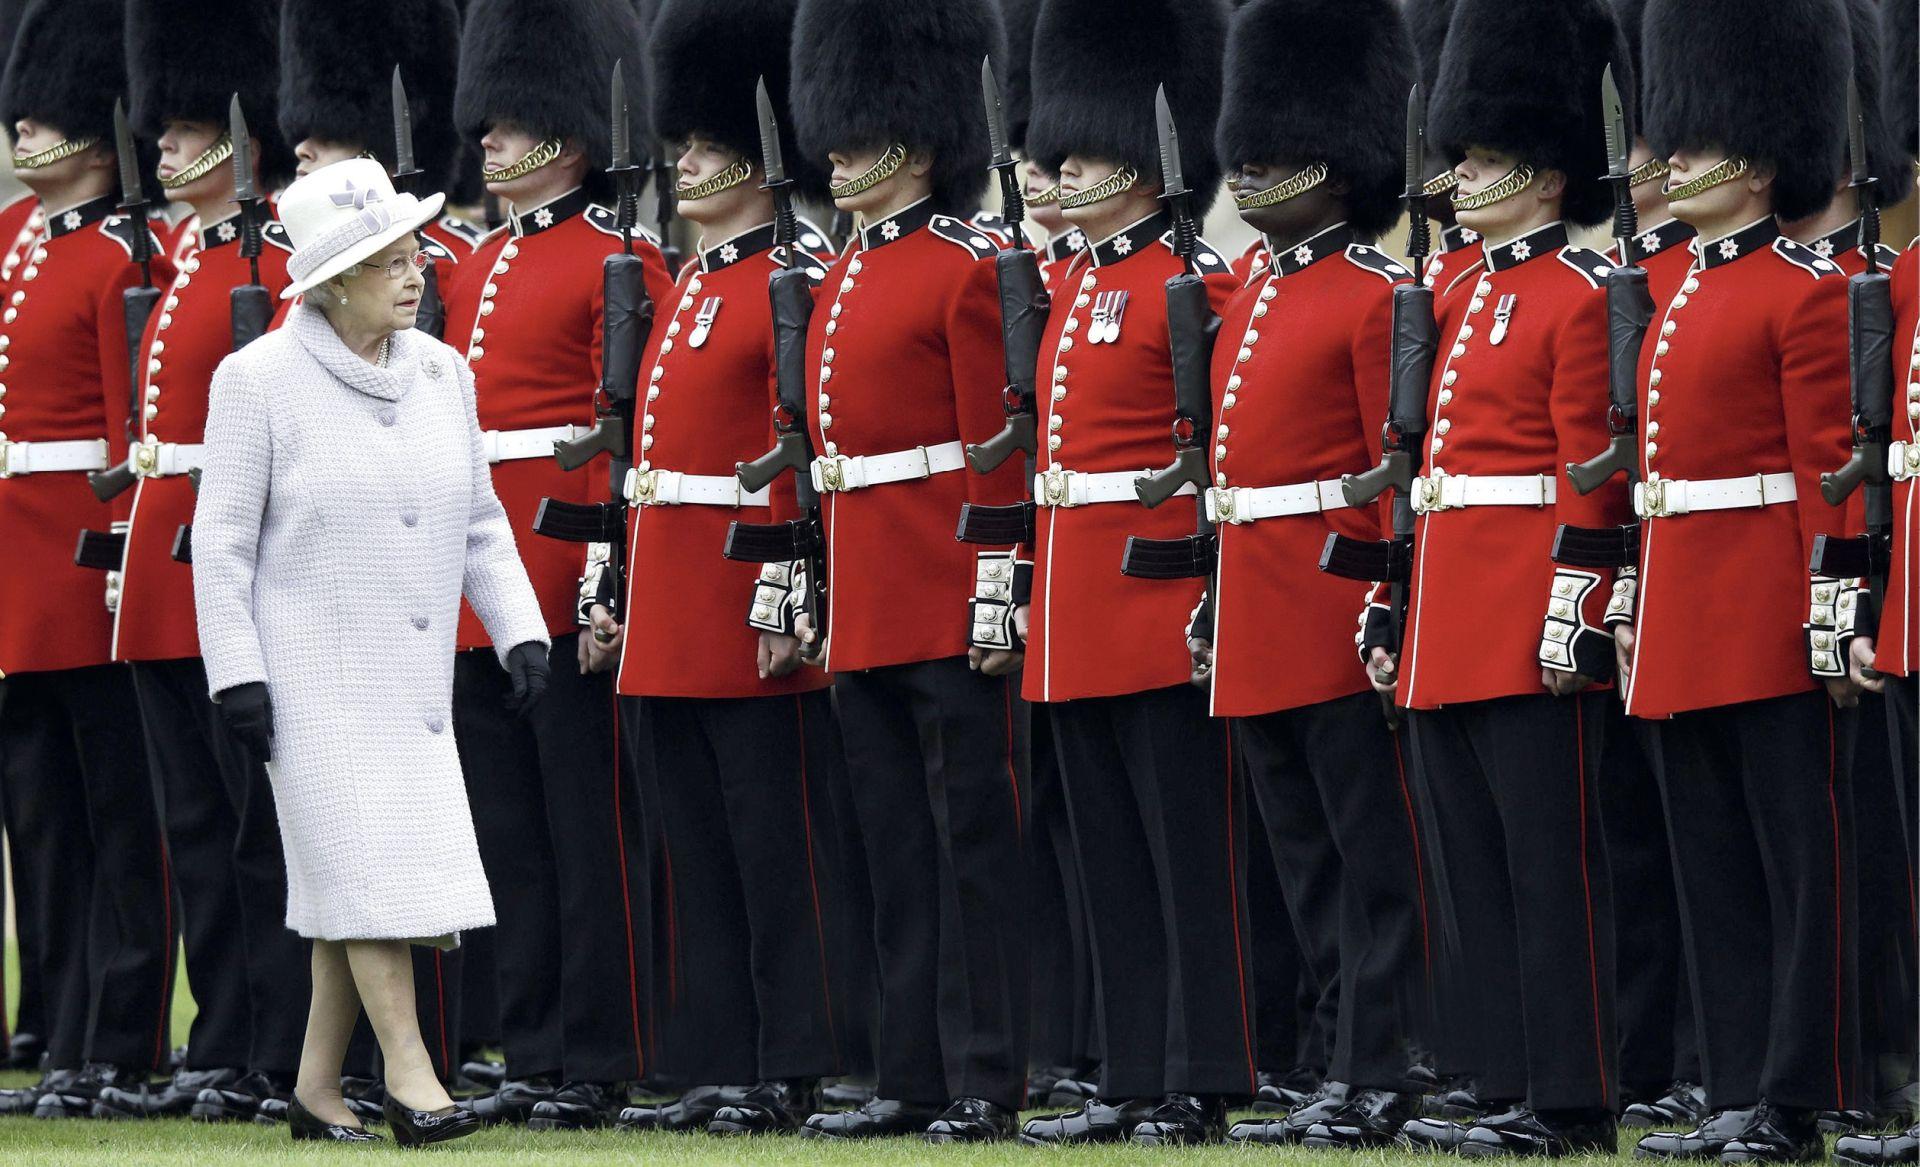 Safirni jubilej kraljice Elizabete u sjeni zahtjeva za abdikacijom